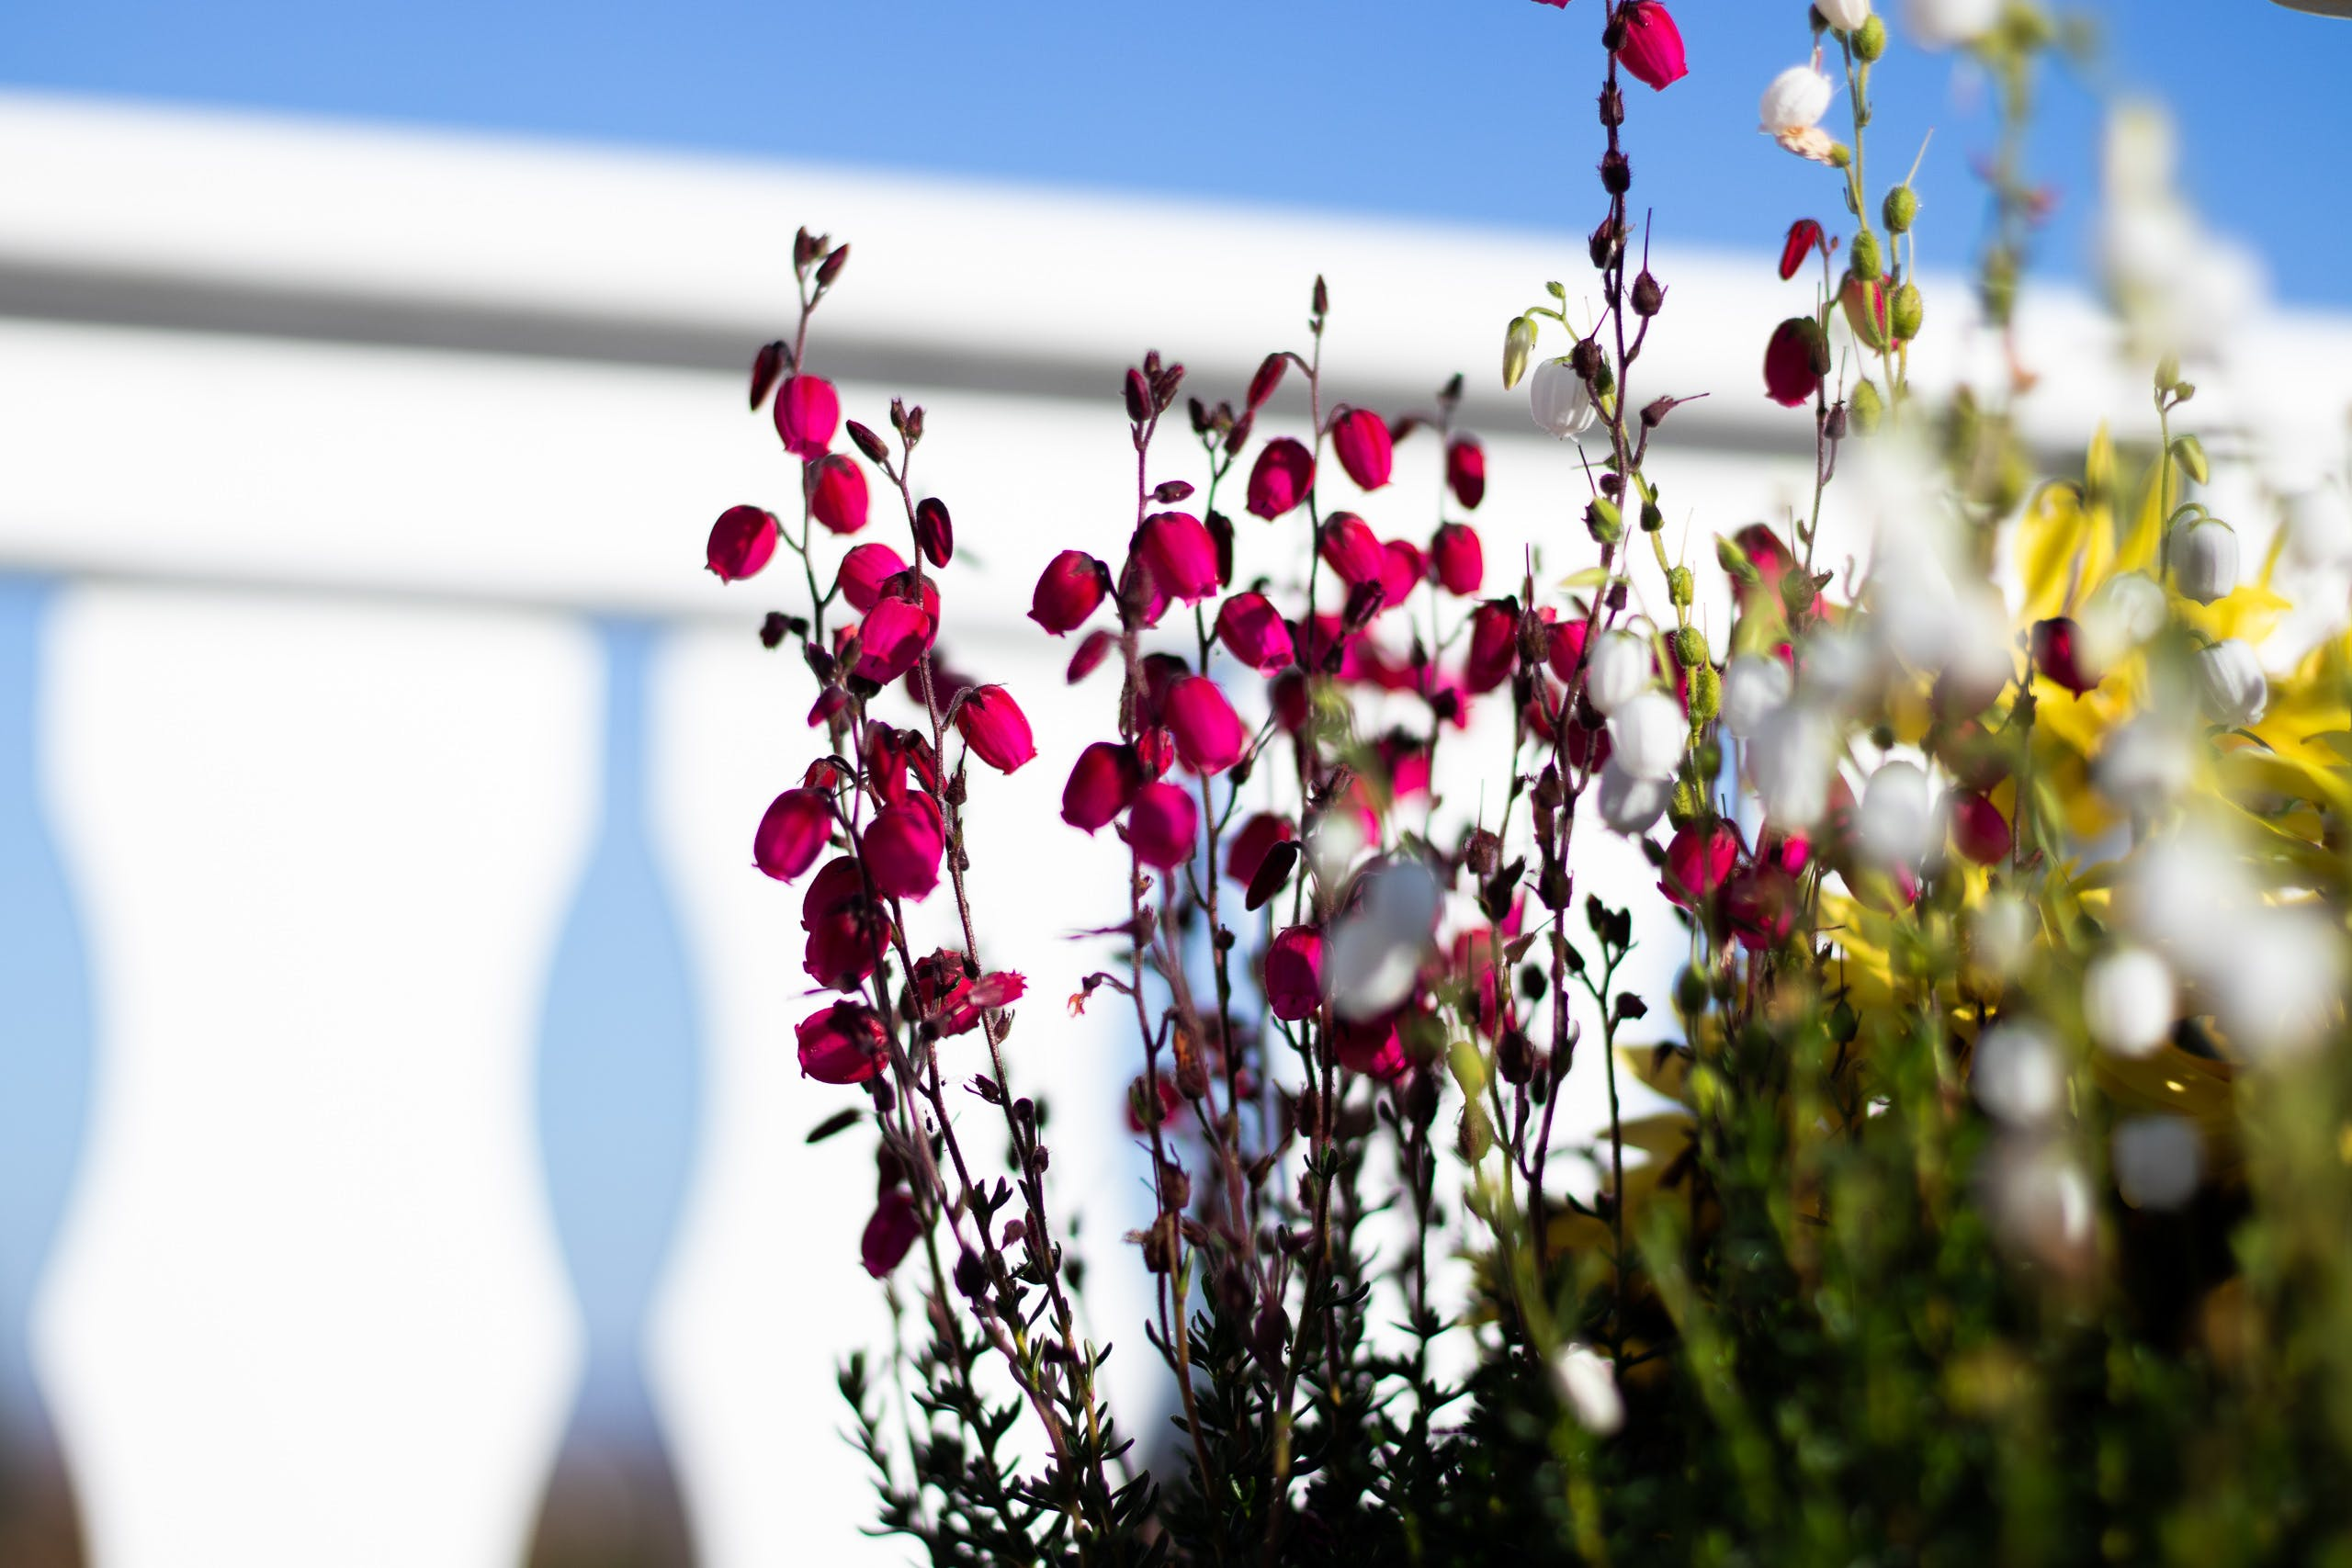 Free stock photo of balcony, beautiful flowers, blue sky, buds